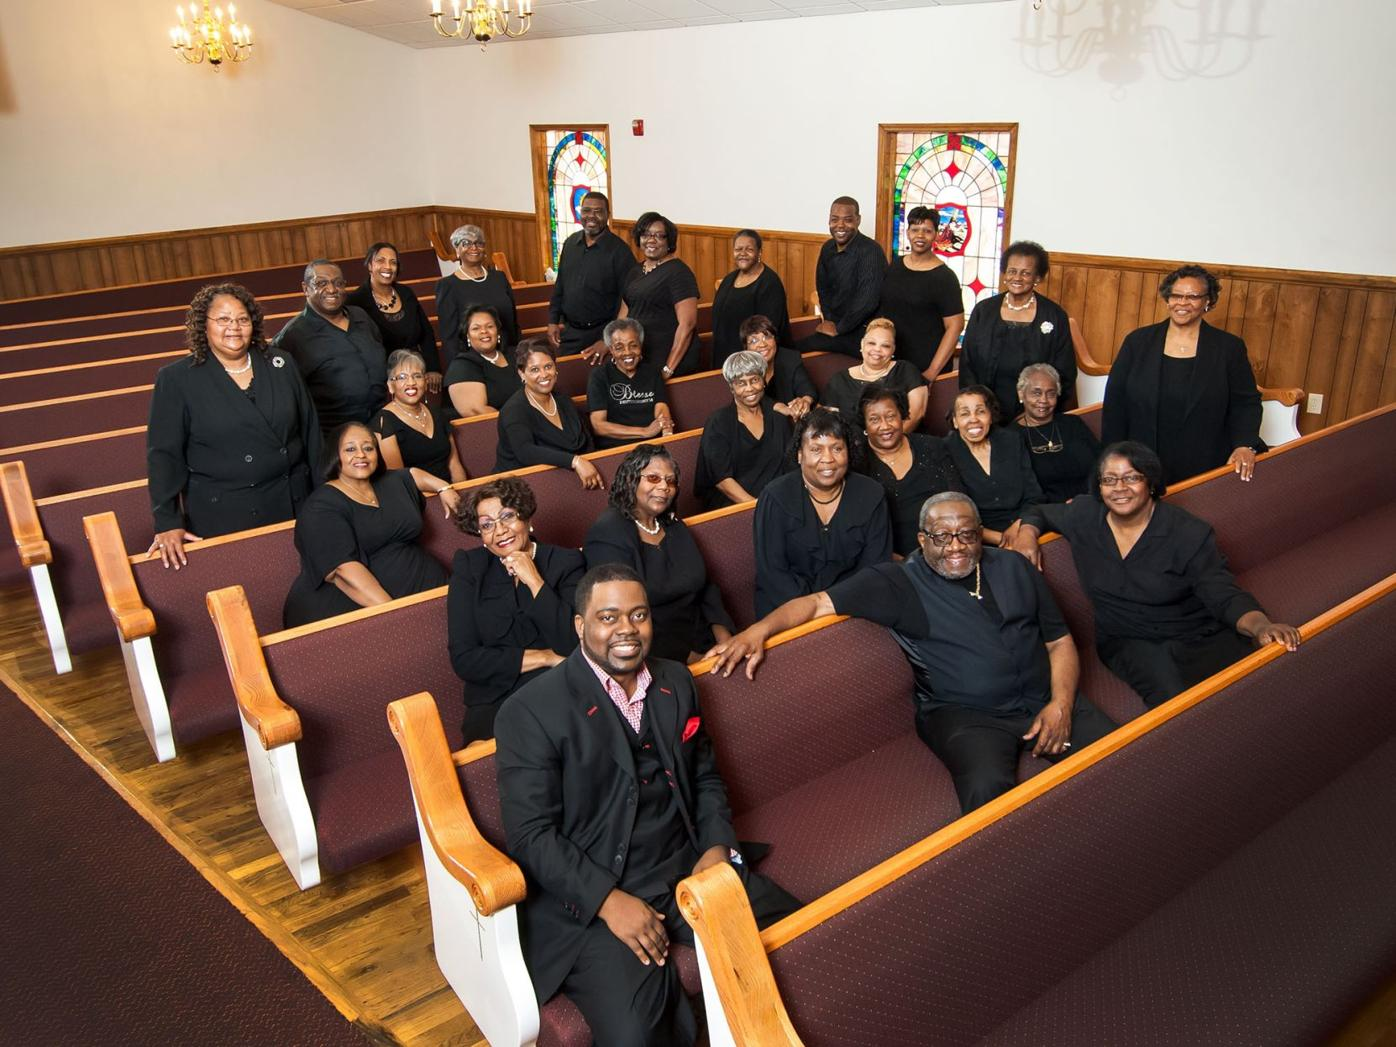 Thomas A. Dorsey Birthplace Choir